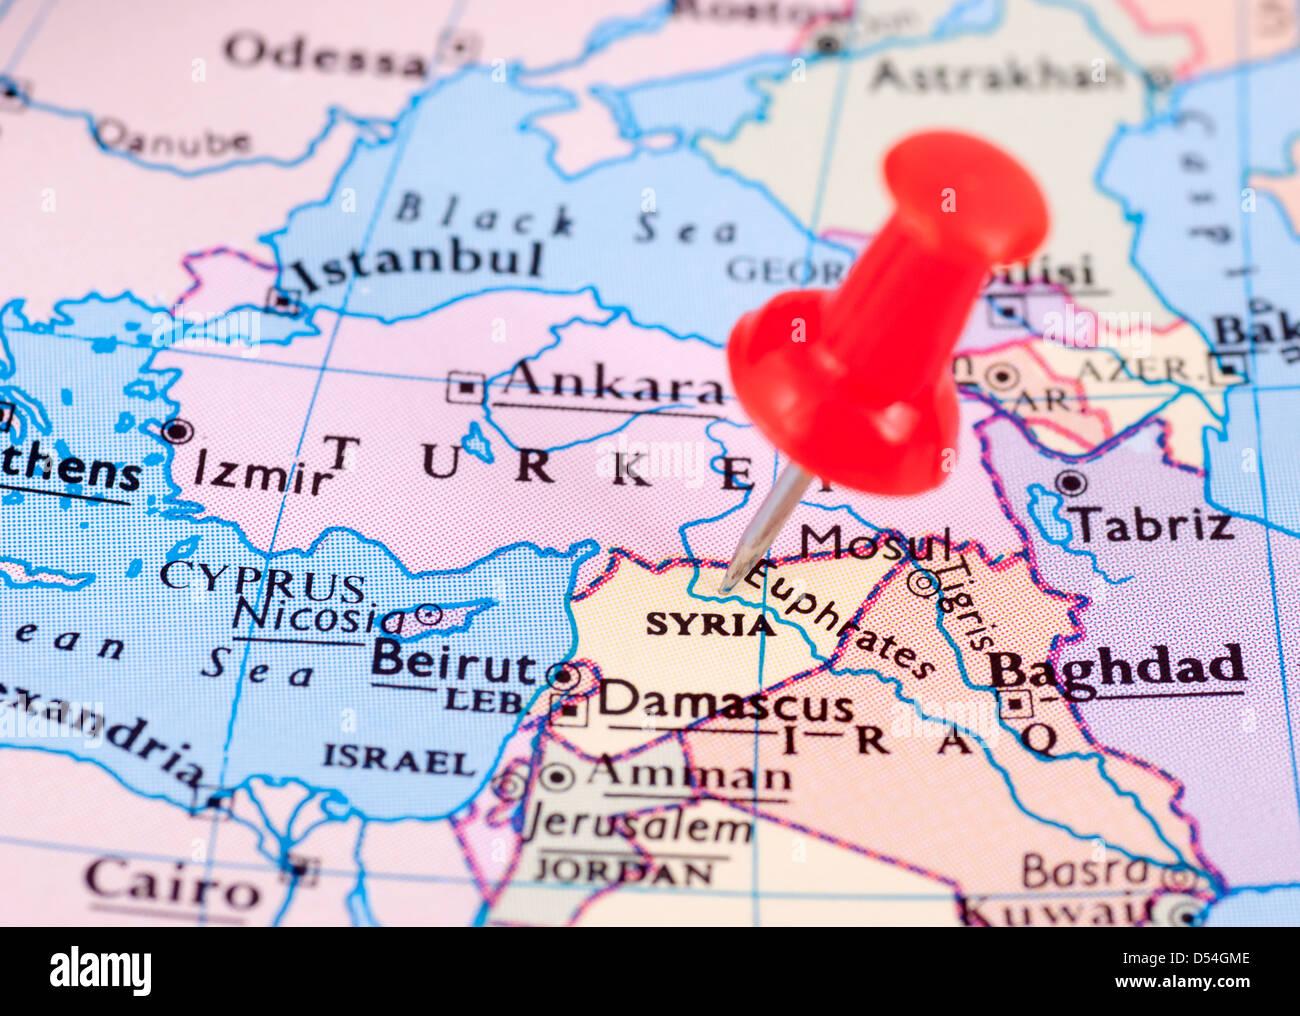 Map Cyprus Syria Turkey Stockfotos & Map Cyprus Syria Turkey Bilder ...